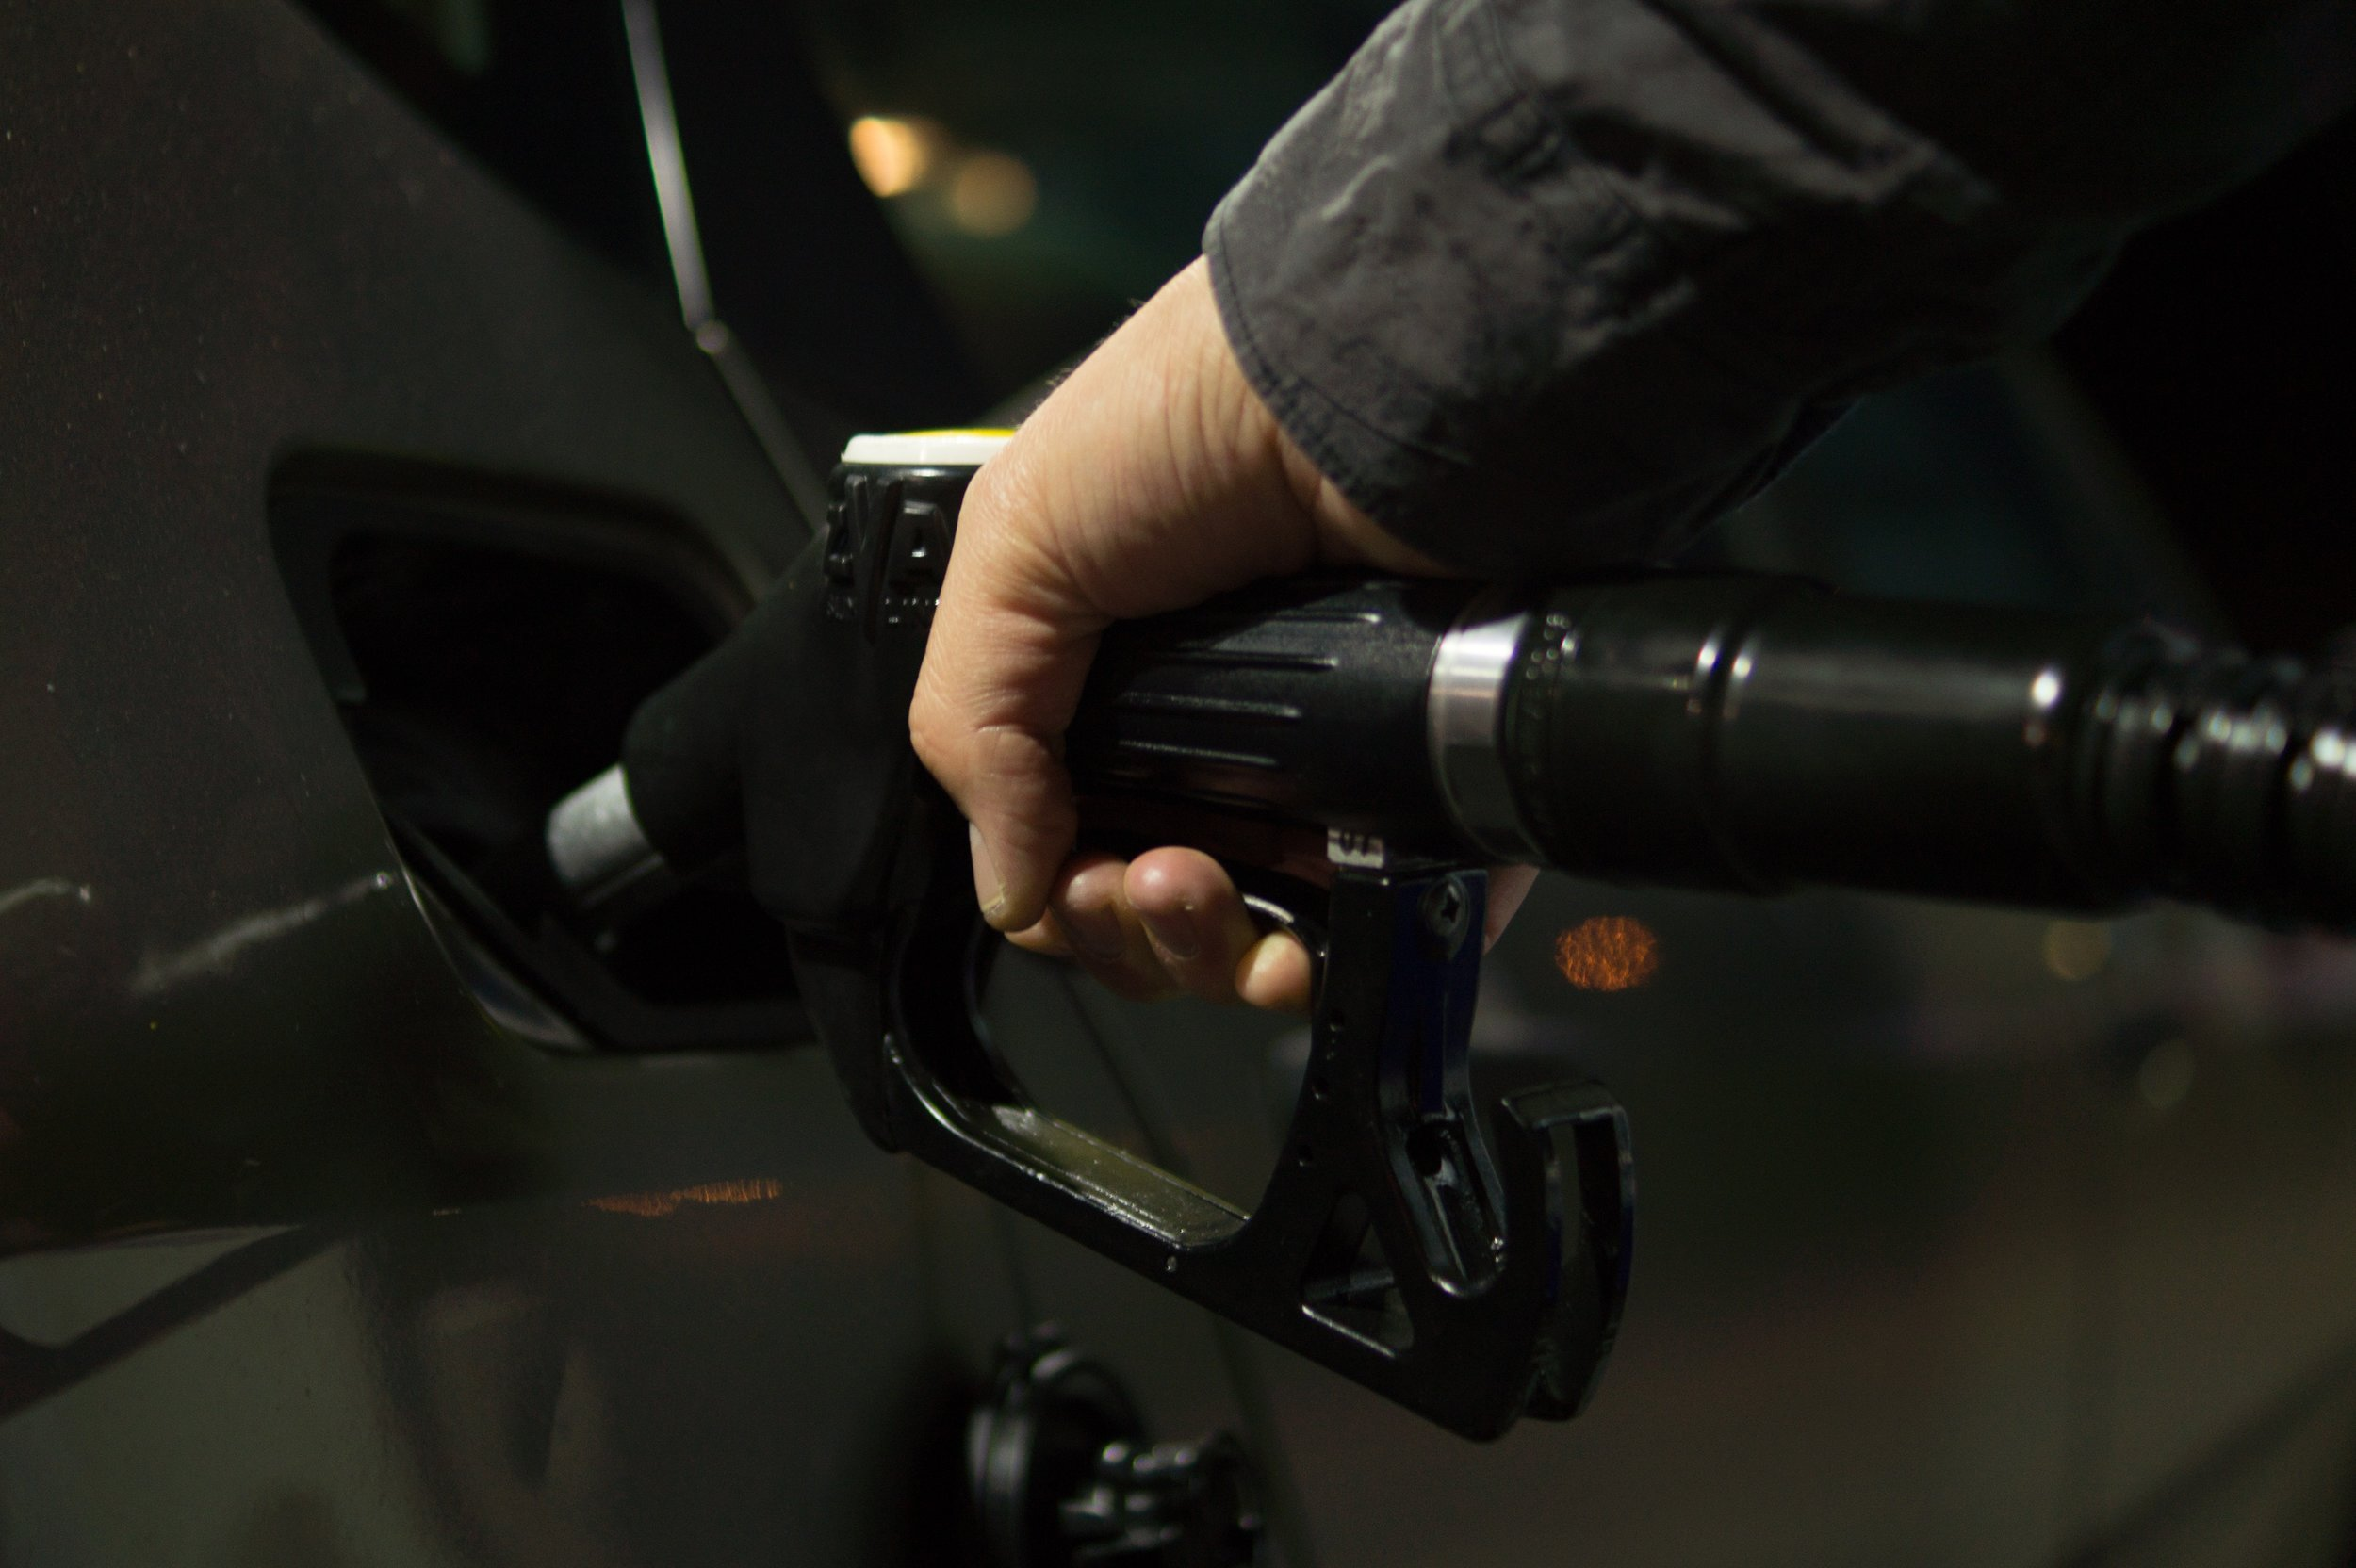 car-filling-station-fuel-pump-9796.jpg